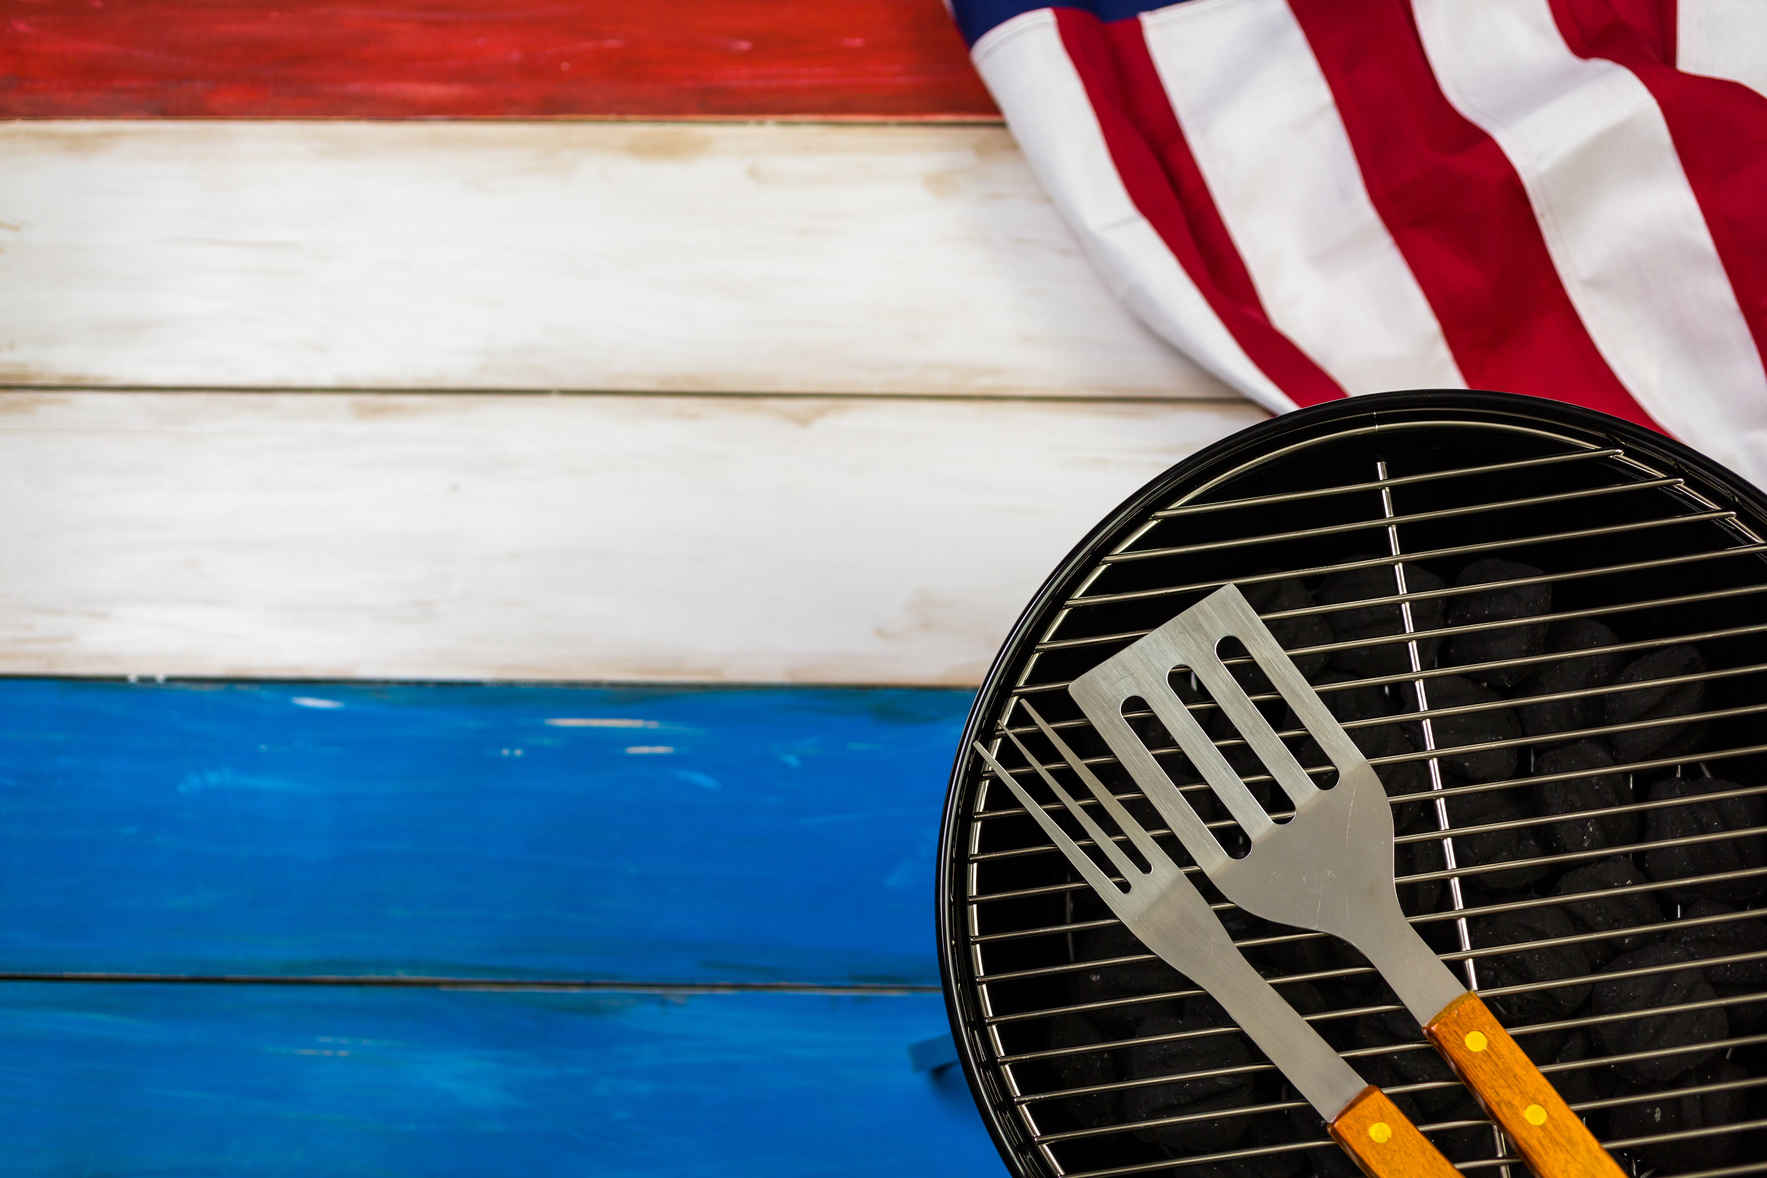 4th of July/BBQ Basket Raffle image